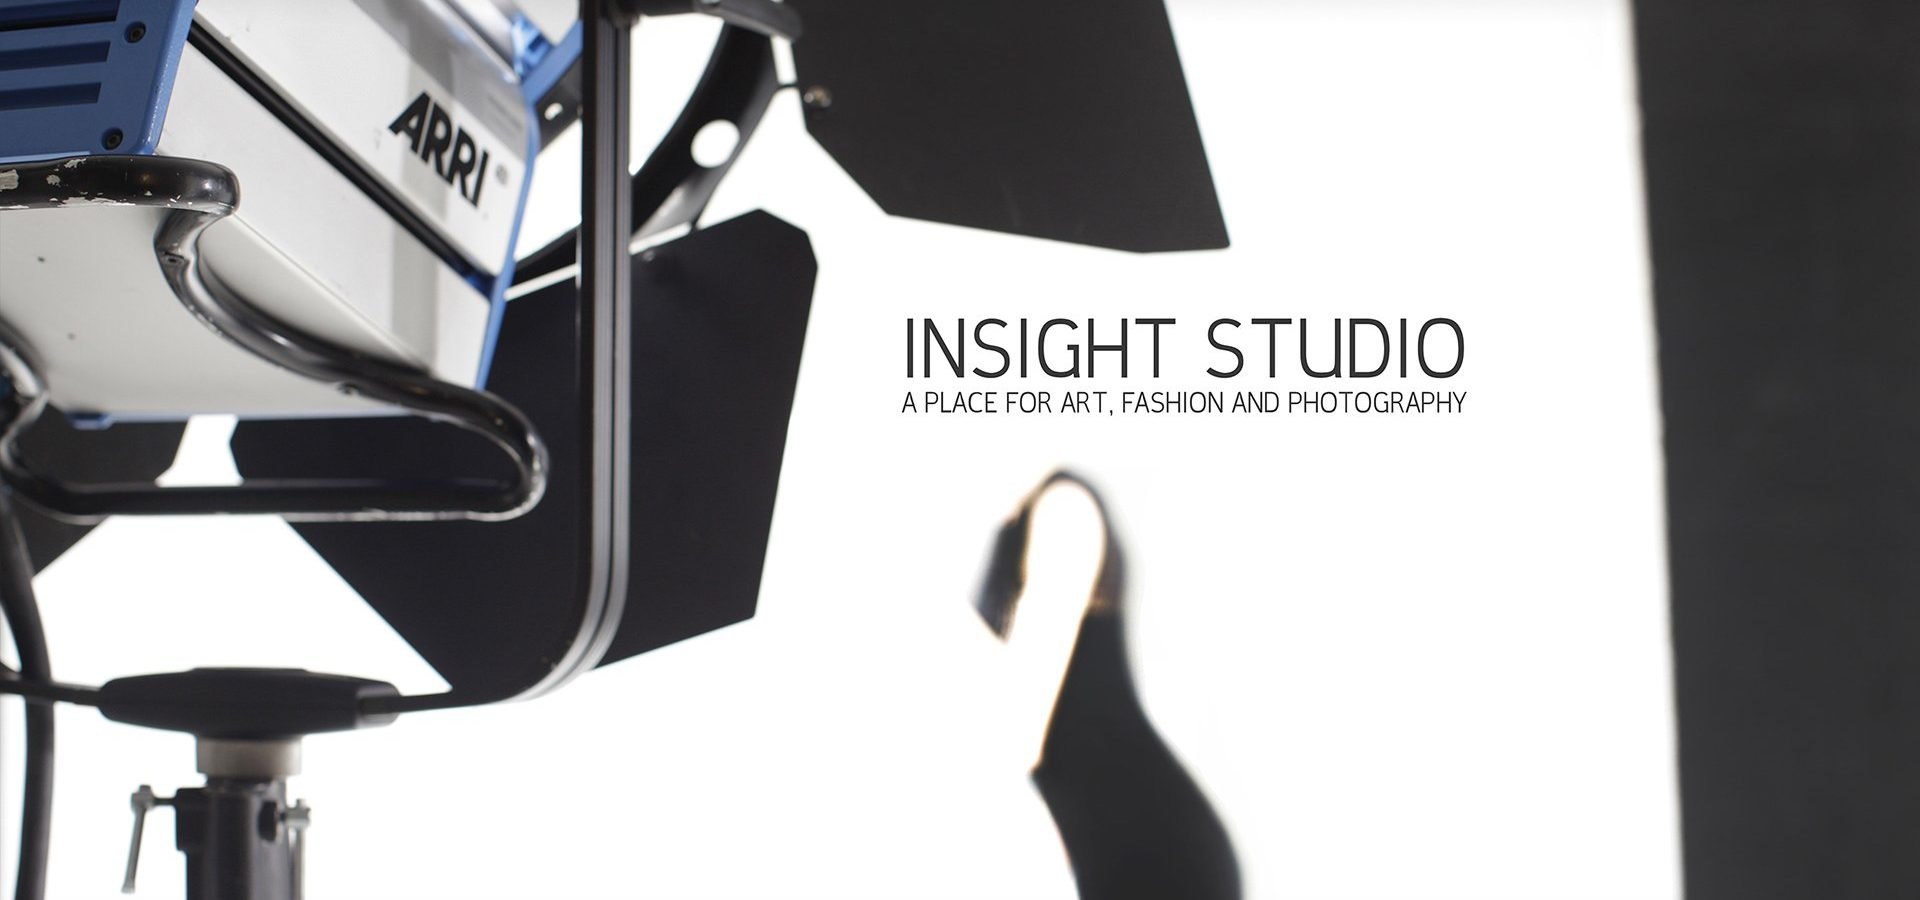 noleggio-studio-fotografico-insight-studio-home1a